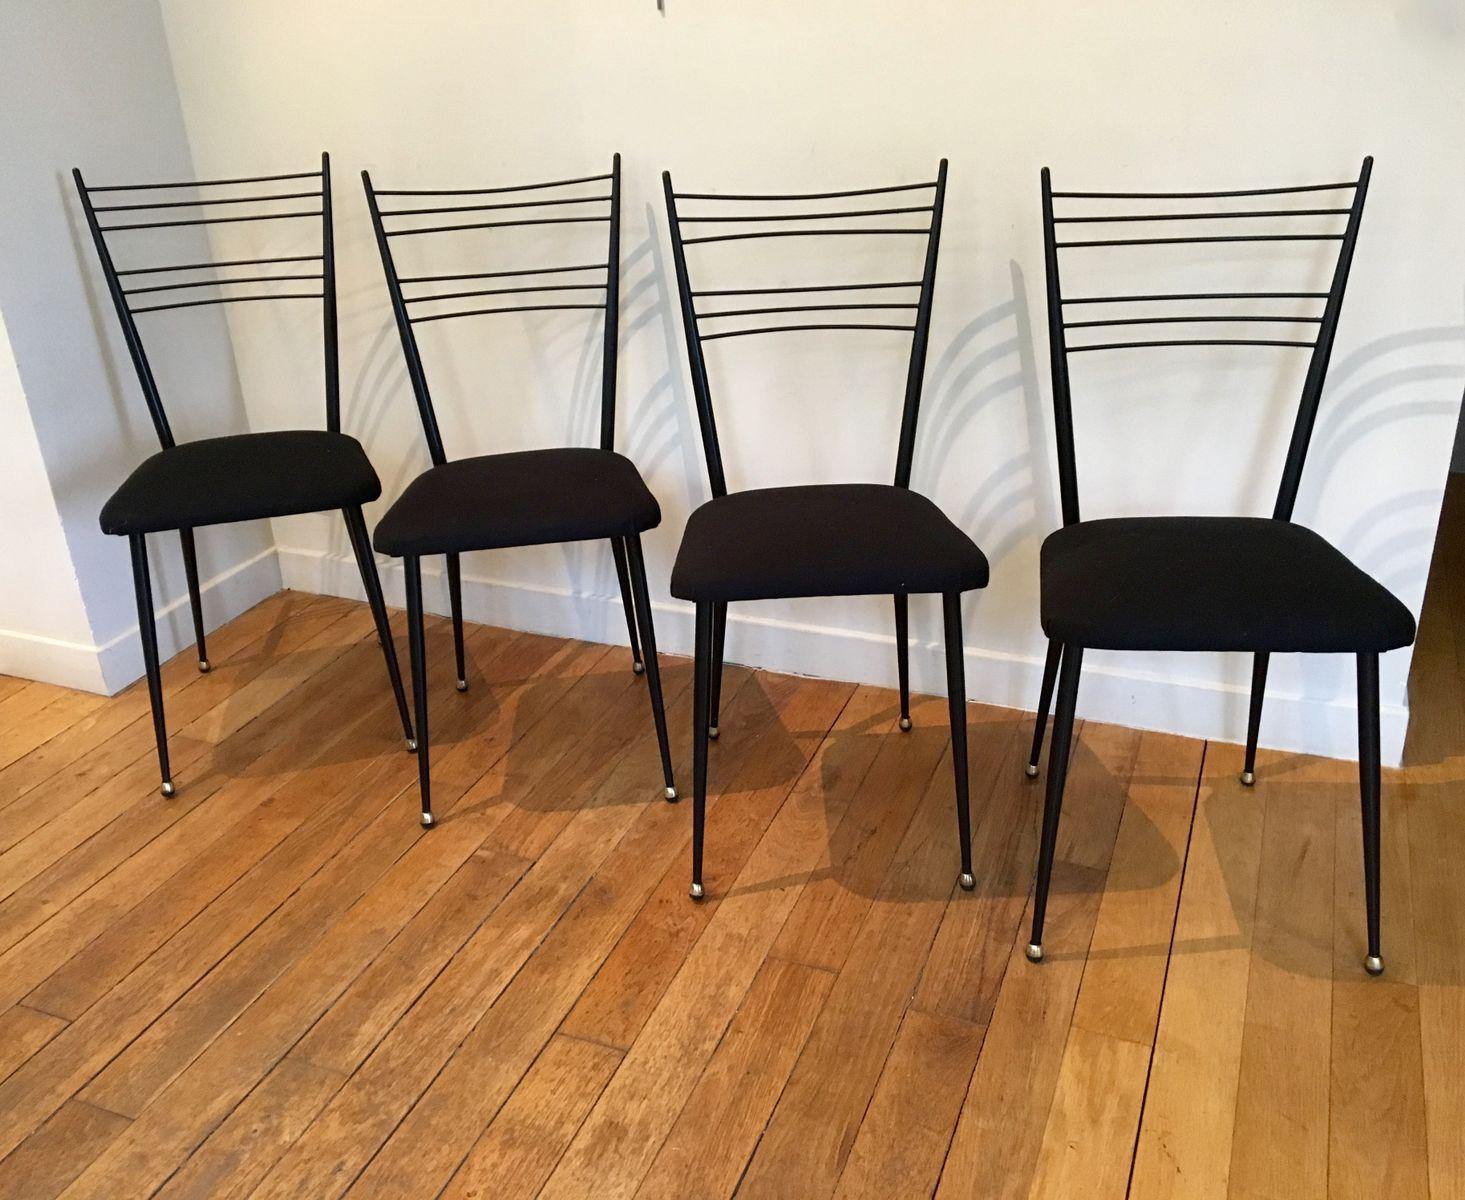 schwarze metallische st hle 1950er 4er set bei pamono kaufen. Black Bedroom Furniture Sets. Home Design Ideas